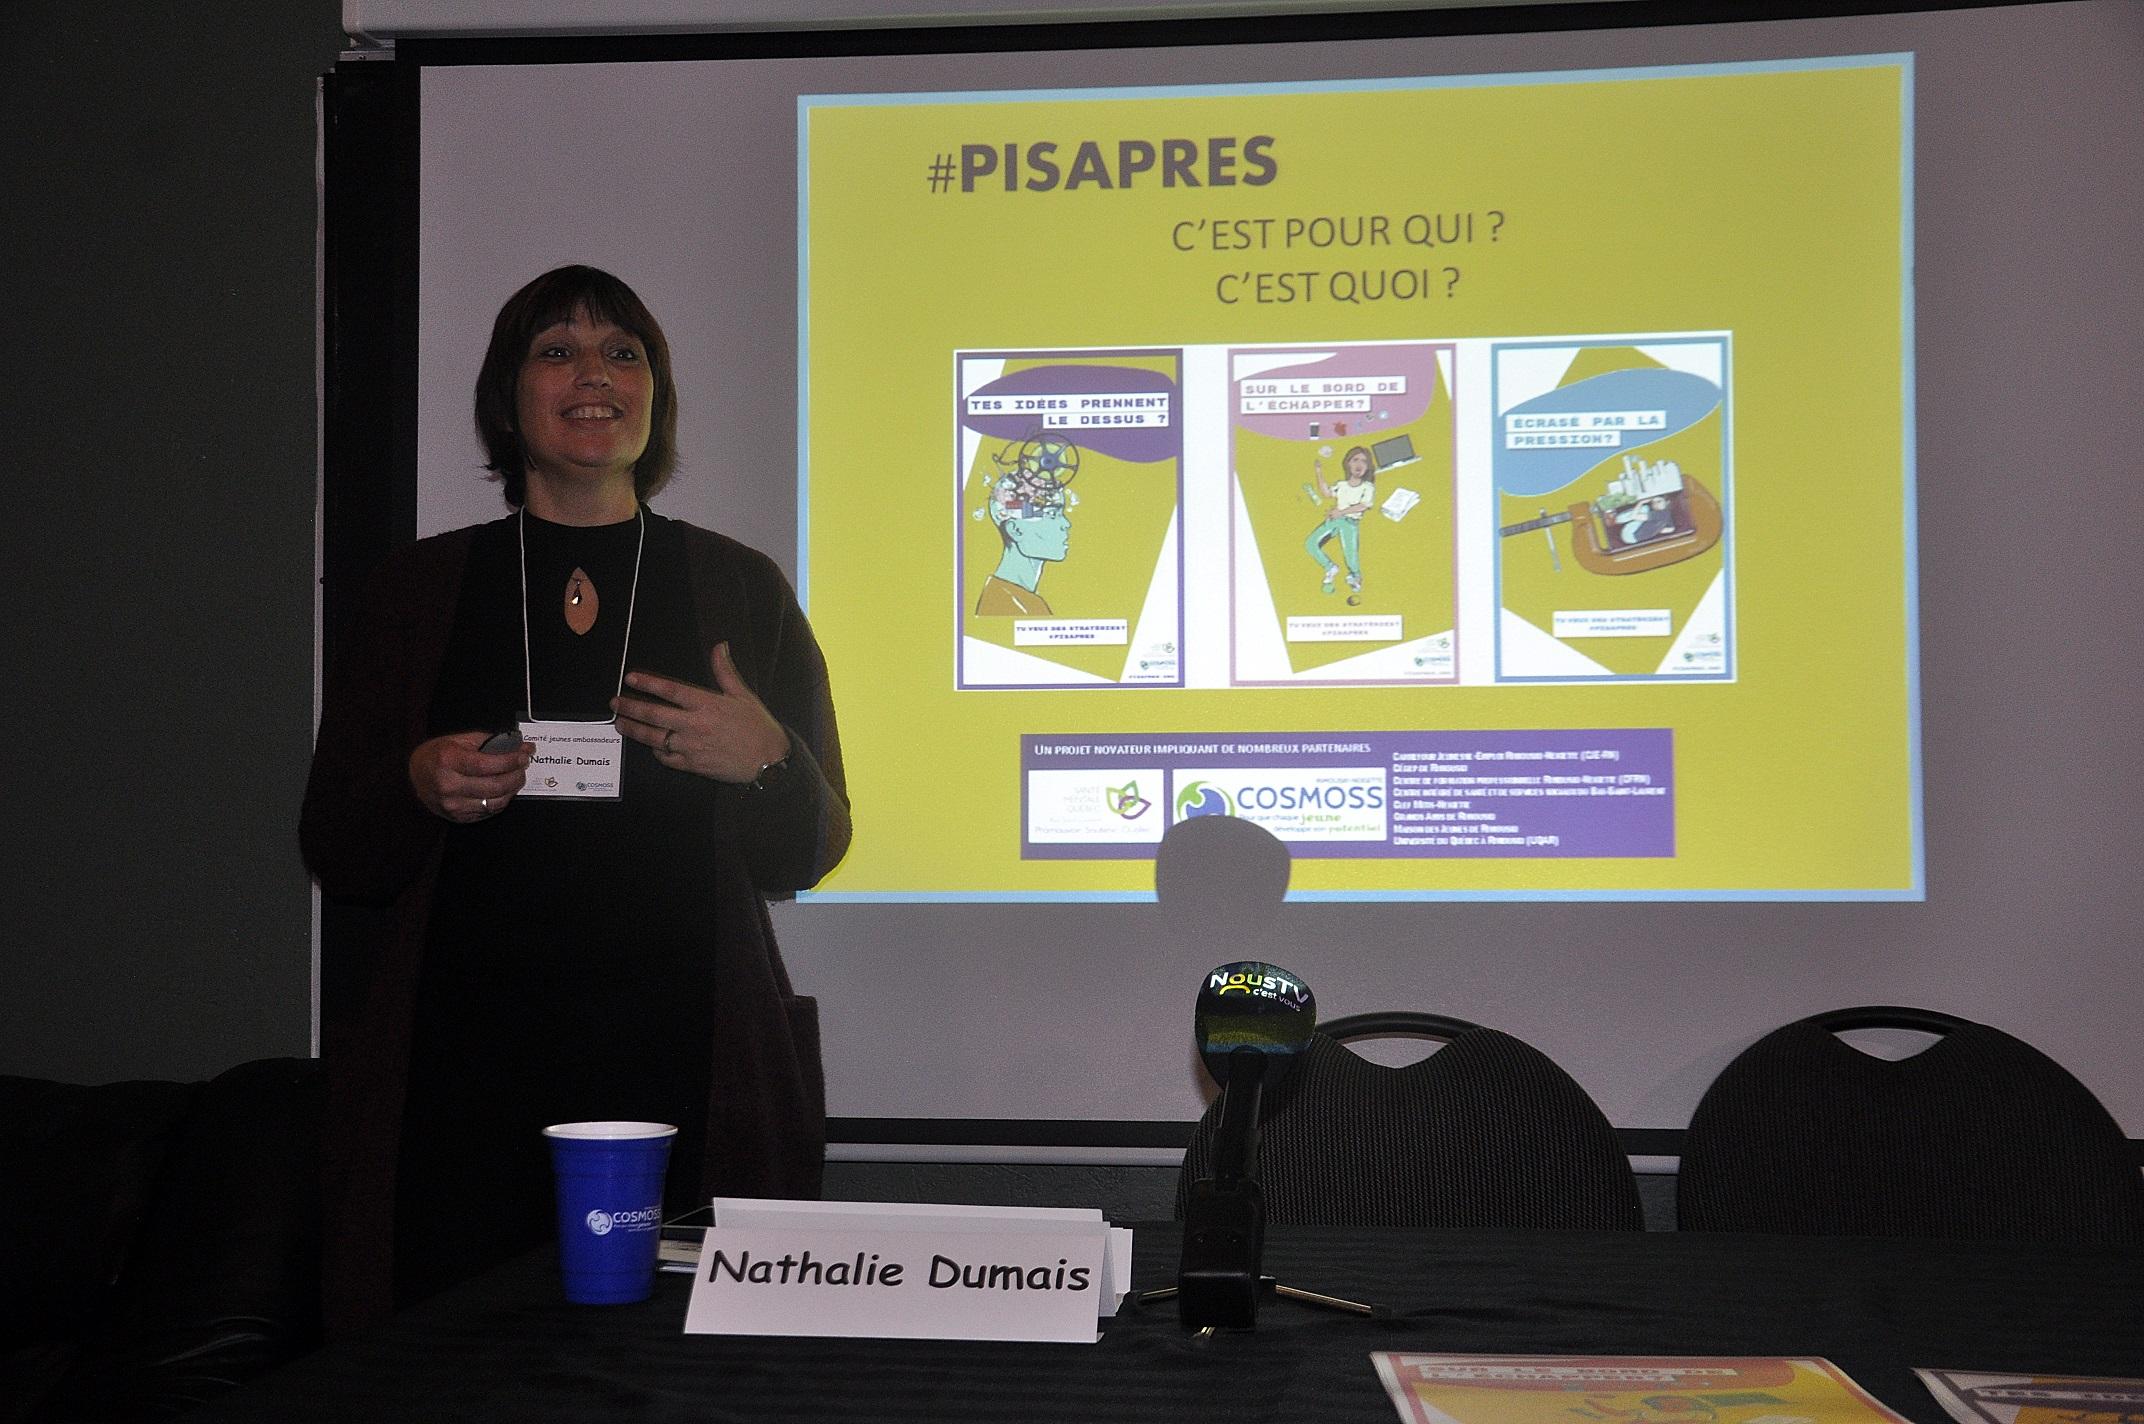 Programme Pisapres